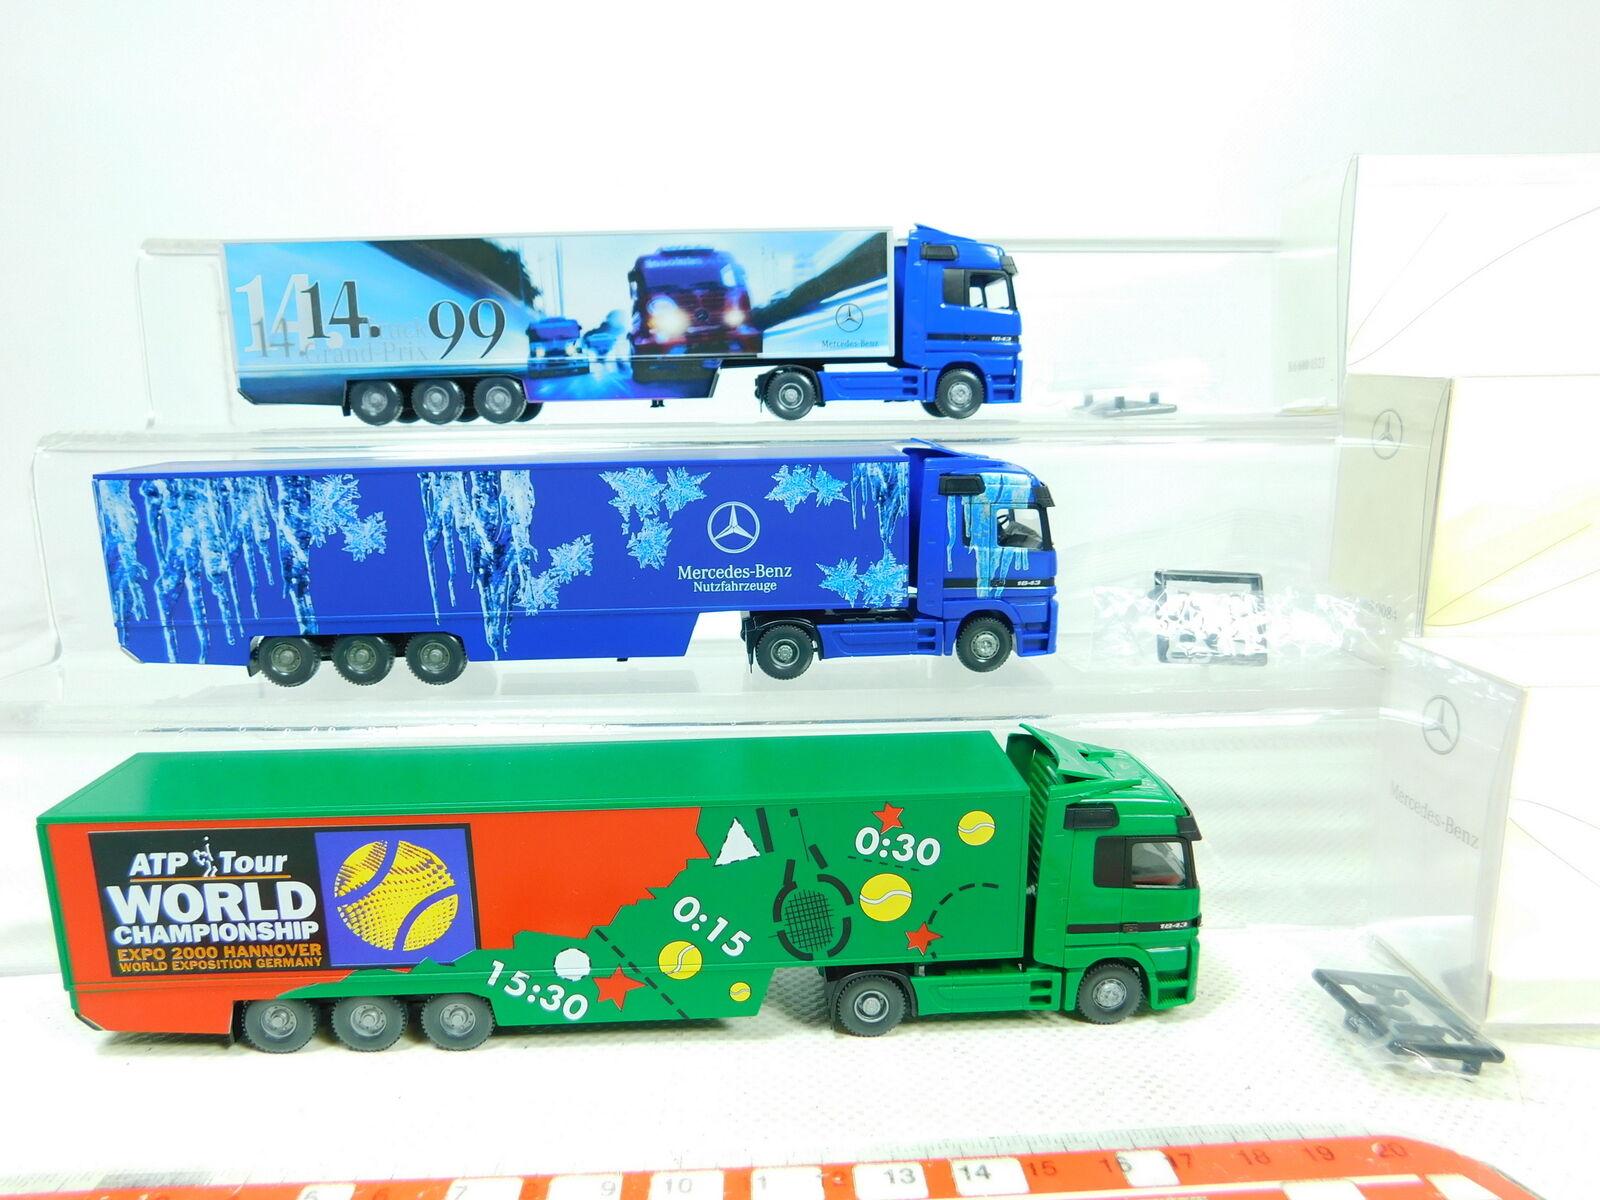 BT338-0,5 x Wiking H0   1 87 Lorry MB MB MB  600 Grand-Prix + Atp etc. ,Very Good dba073